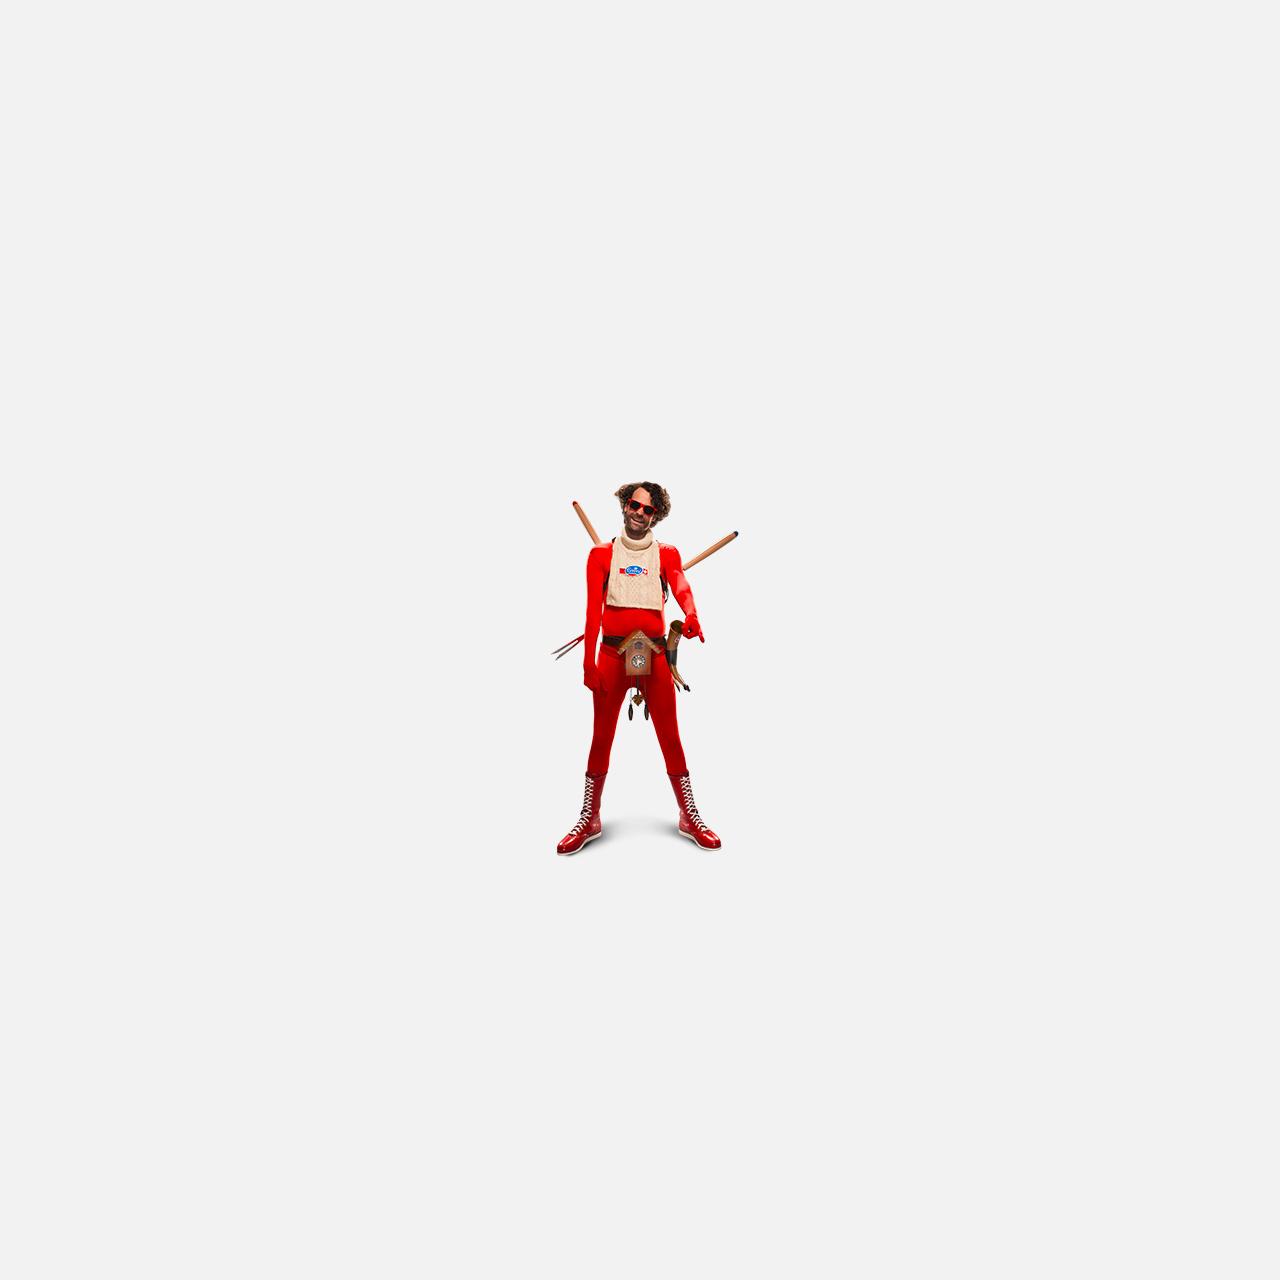 Mann mit rotem Anzug